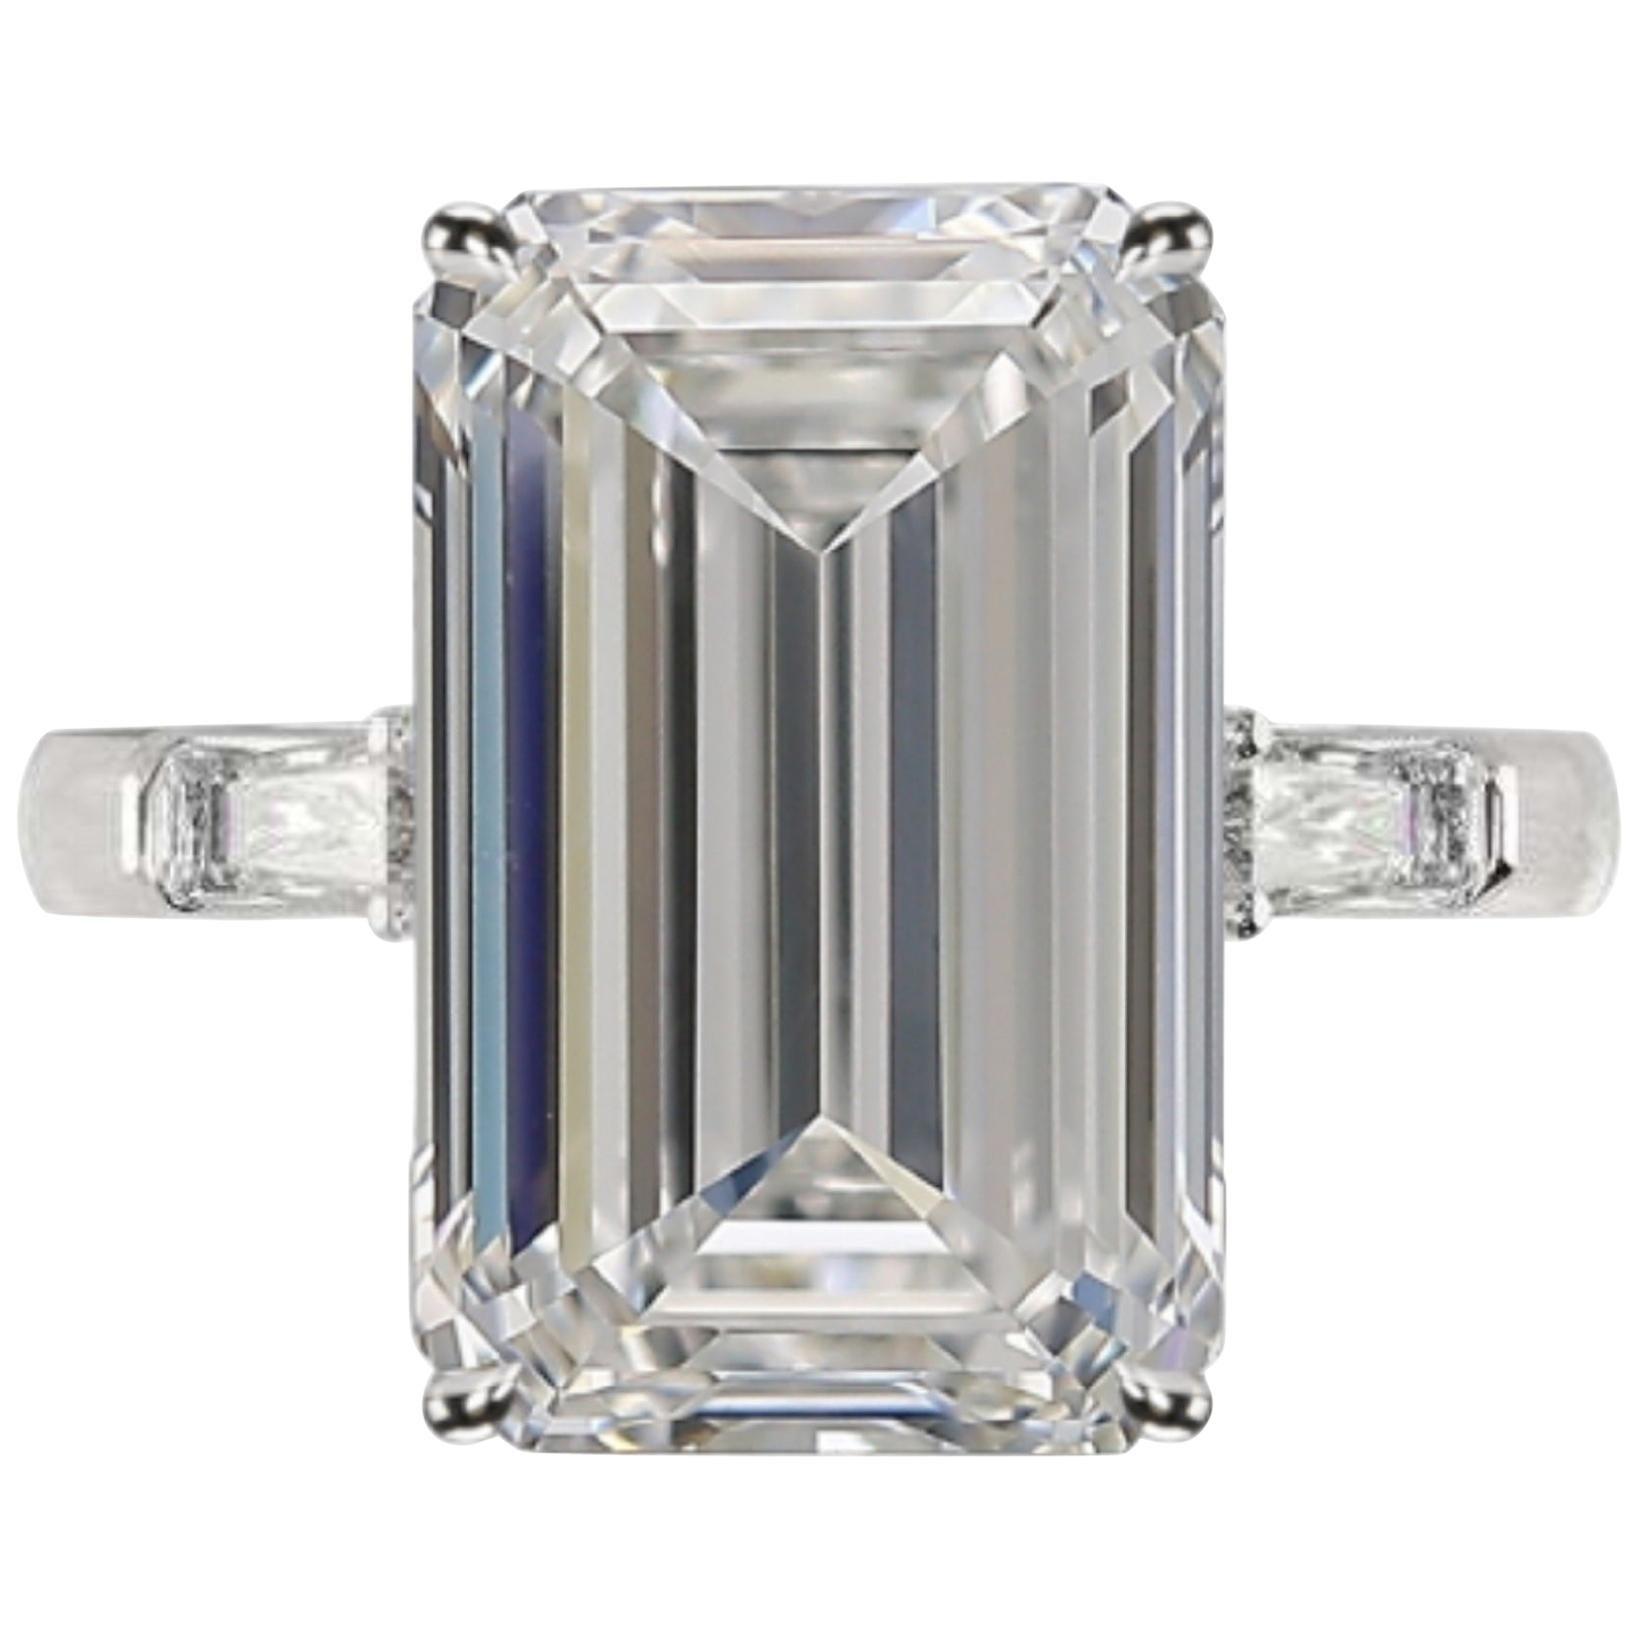 GIA Certified 4.50 Carat Emerald Cut Diamond Ring Long Ratio